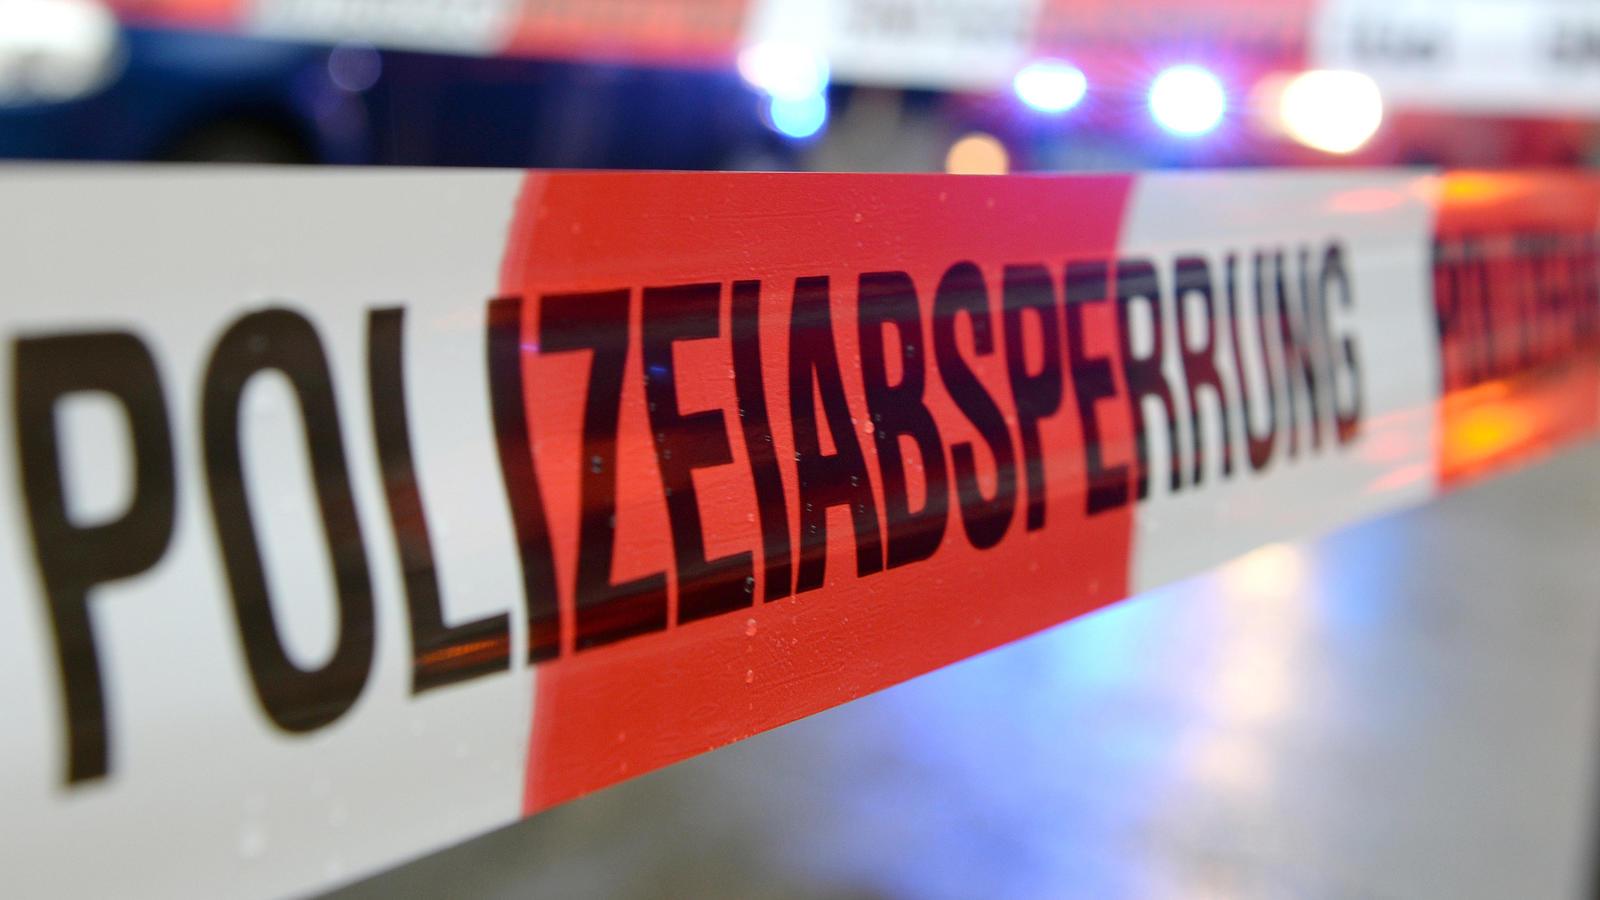 Frau in Offenbach niedergeschossen